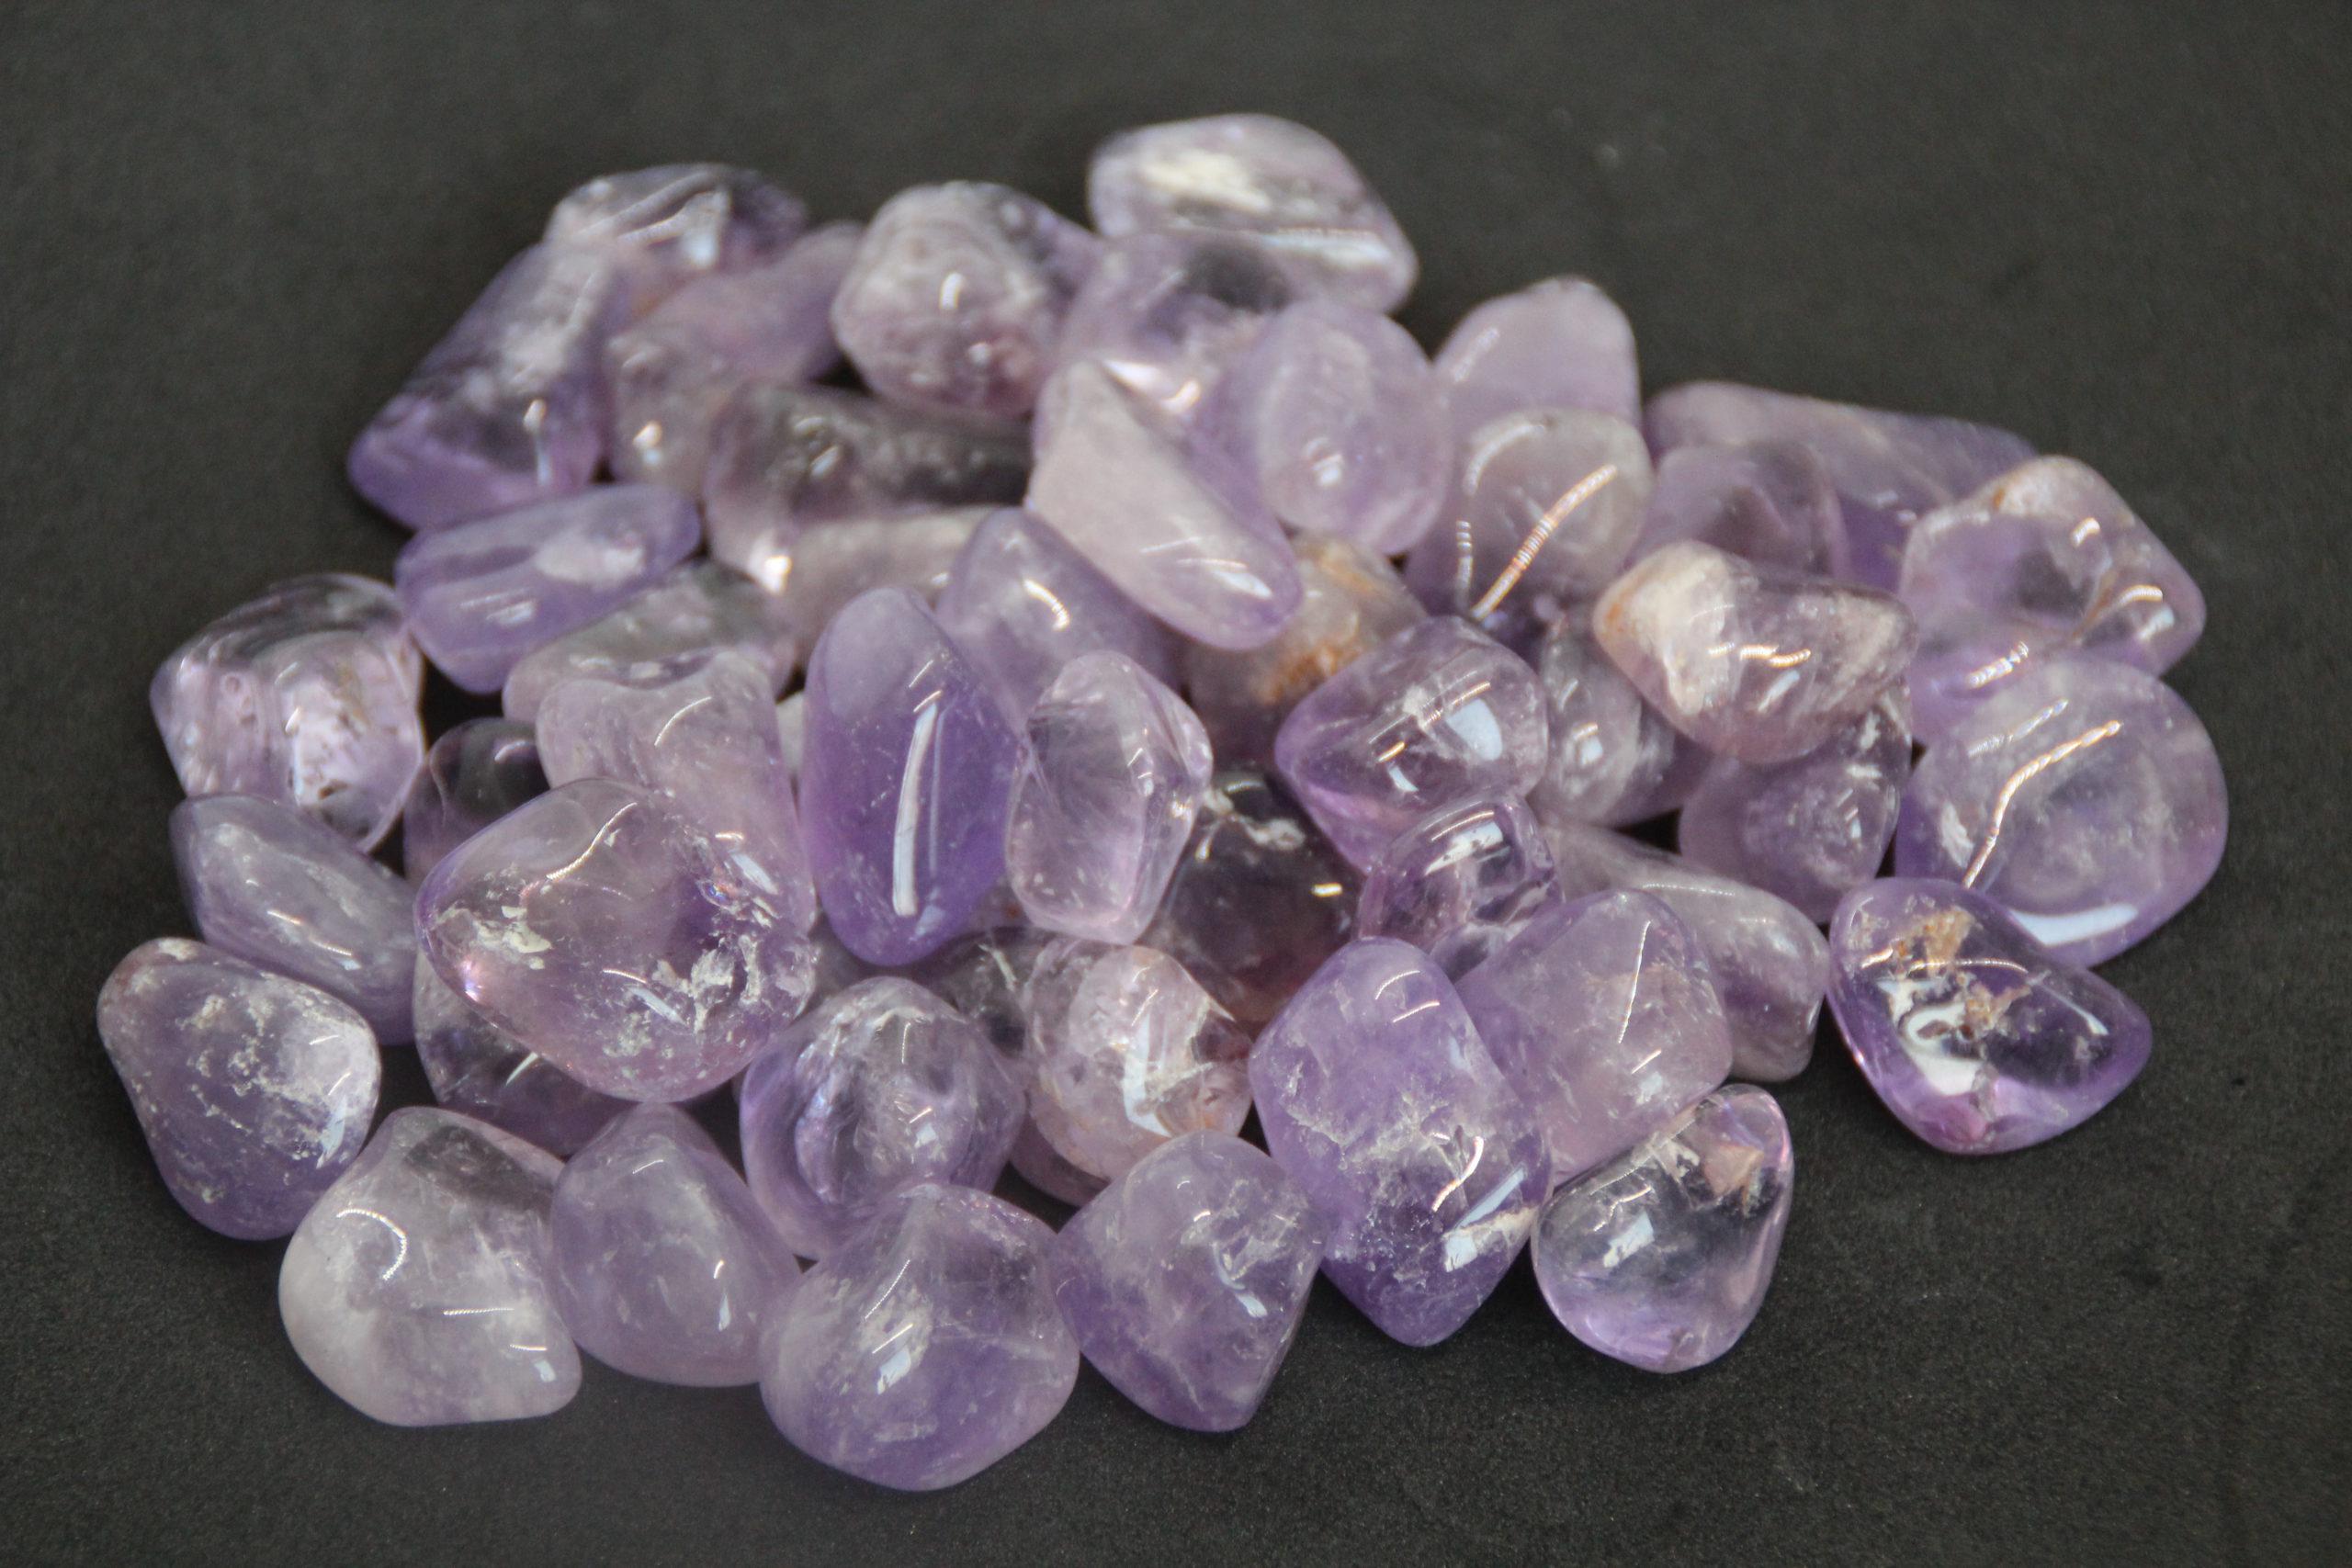 amethyste-du-bresil-pierres-roulees-shiva-esoterisme-lithotherapie-halluin-menen-paris-lille-nice-strasbourg-cannes